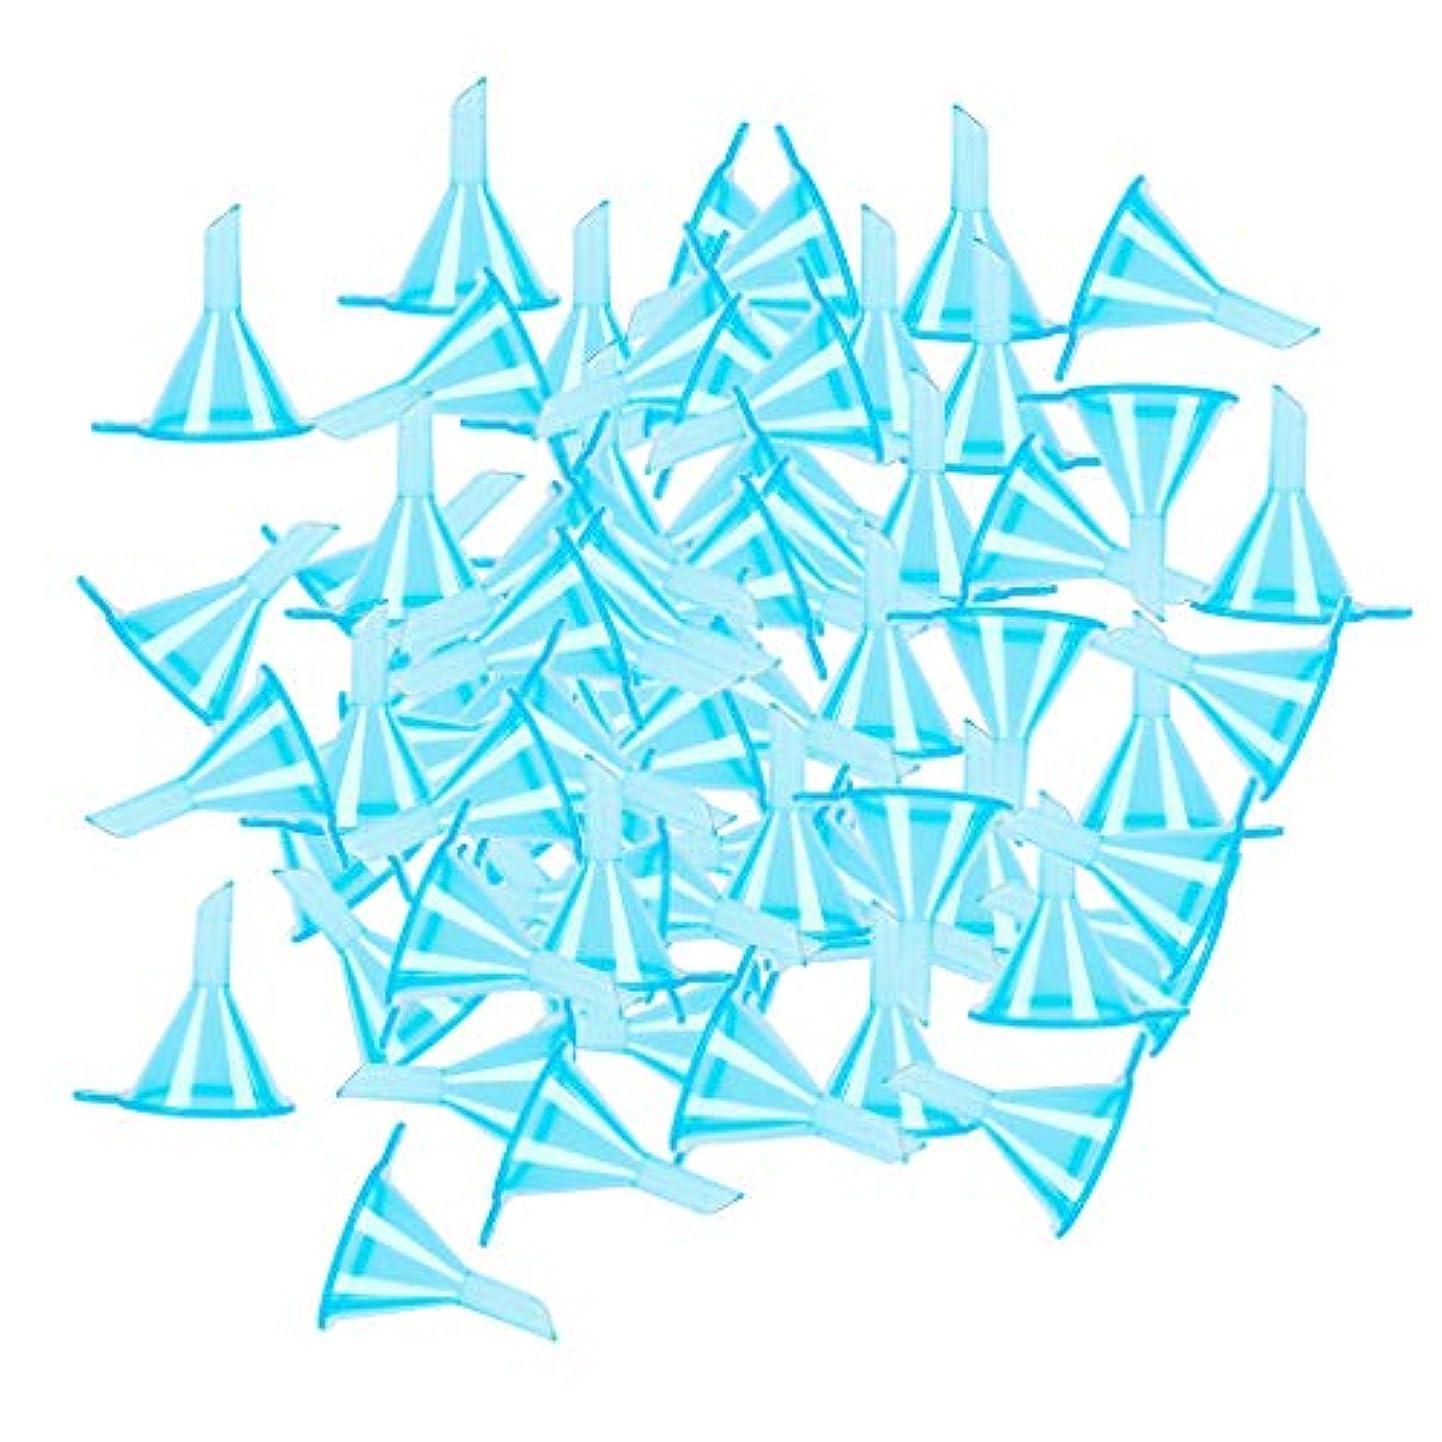 gazechimp ファンネル 漏斗 エッセンシャルオイル 香水ボトルのため 全100点 3カラー選ぶ - ブルー